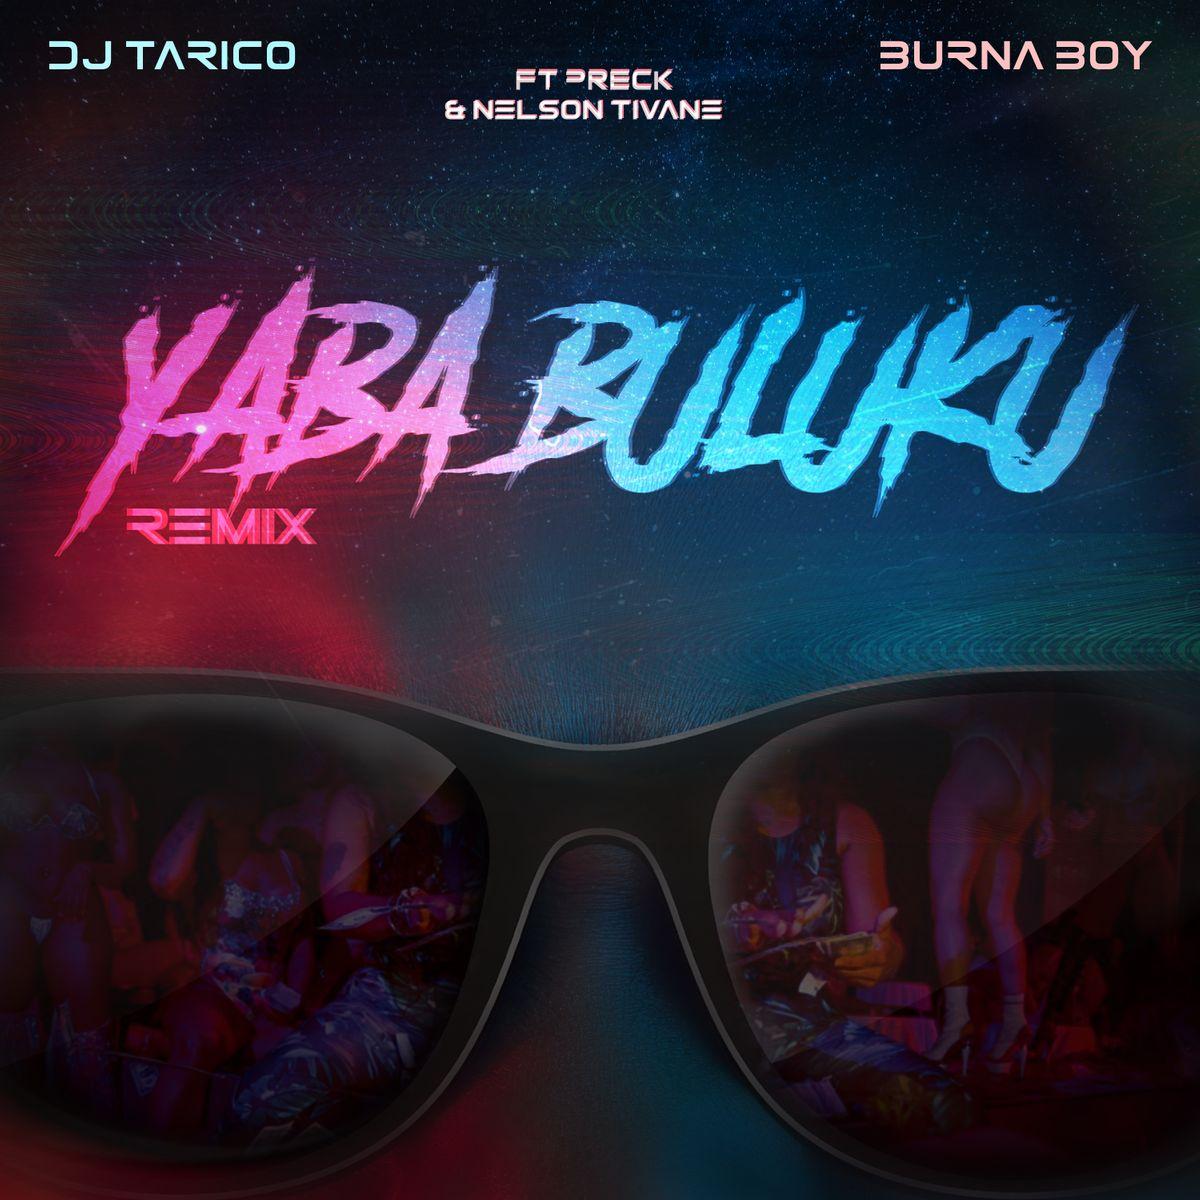 DJ Tarico & Burna Boy ft. Preck & Nelson Tivane - Yaba Buluku (Remix)